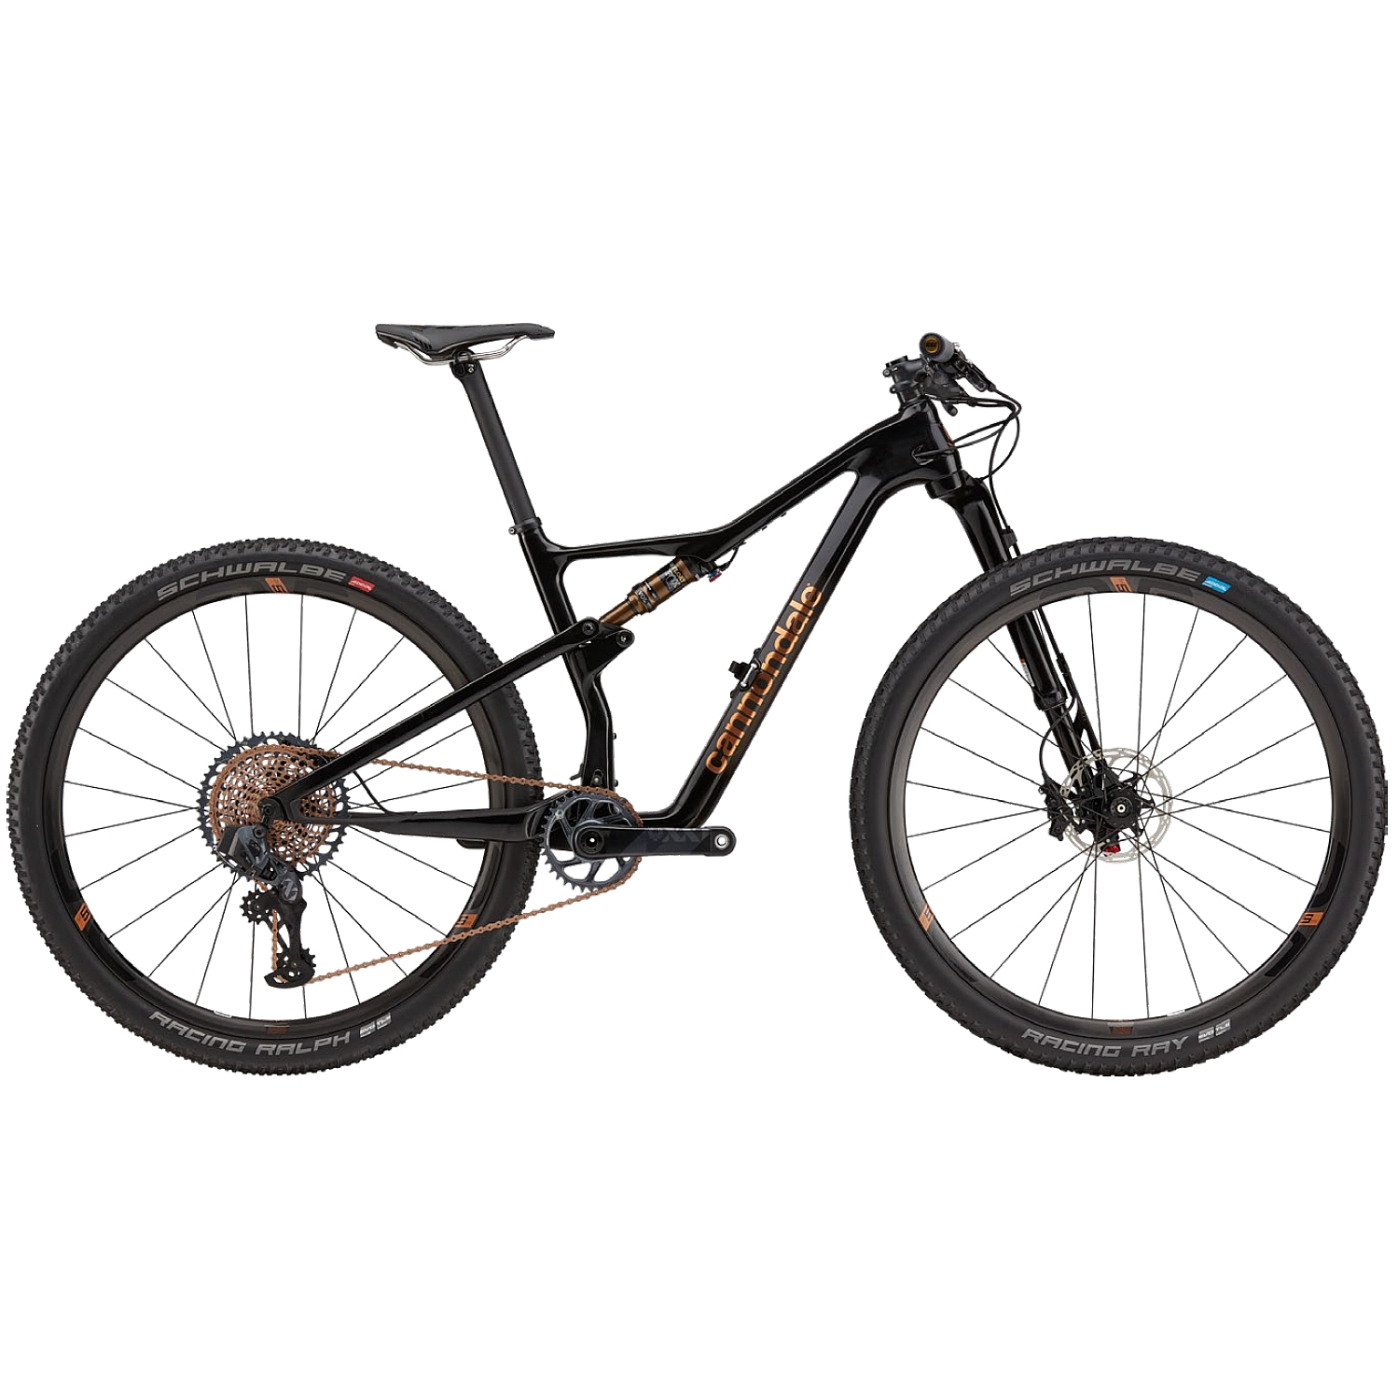 "Cannondale SCALPEL Hi-MOD CARBON Ultimate - 29"" Mountainbike - 2021 - Copper"